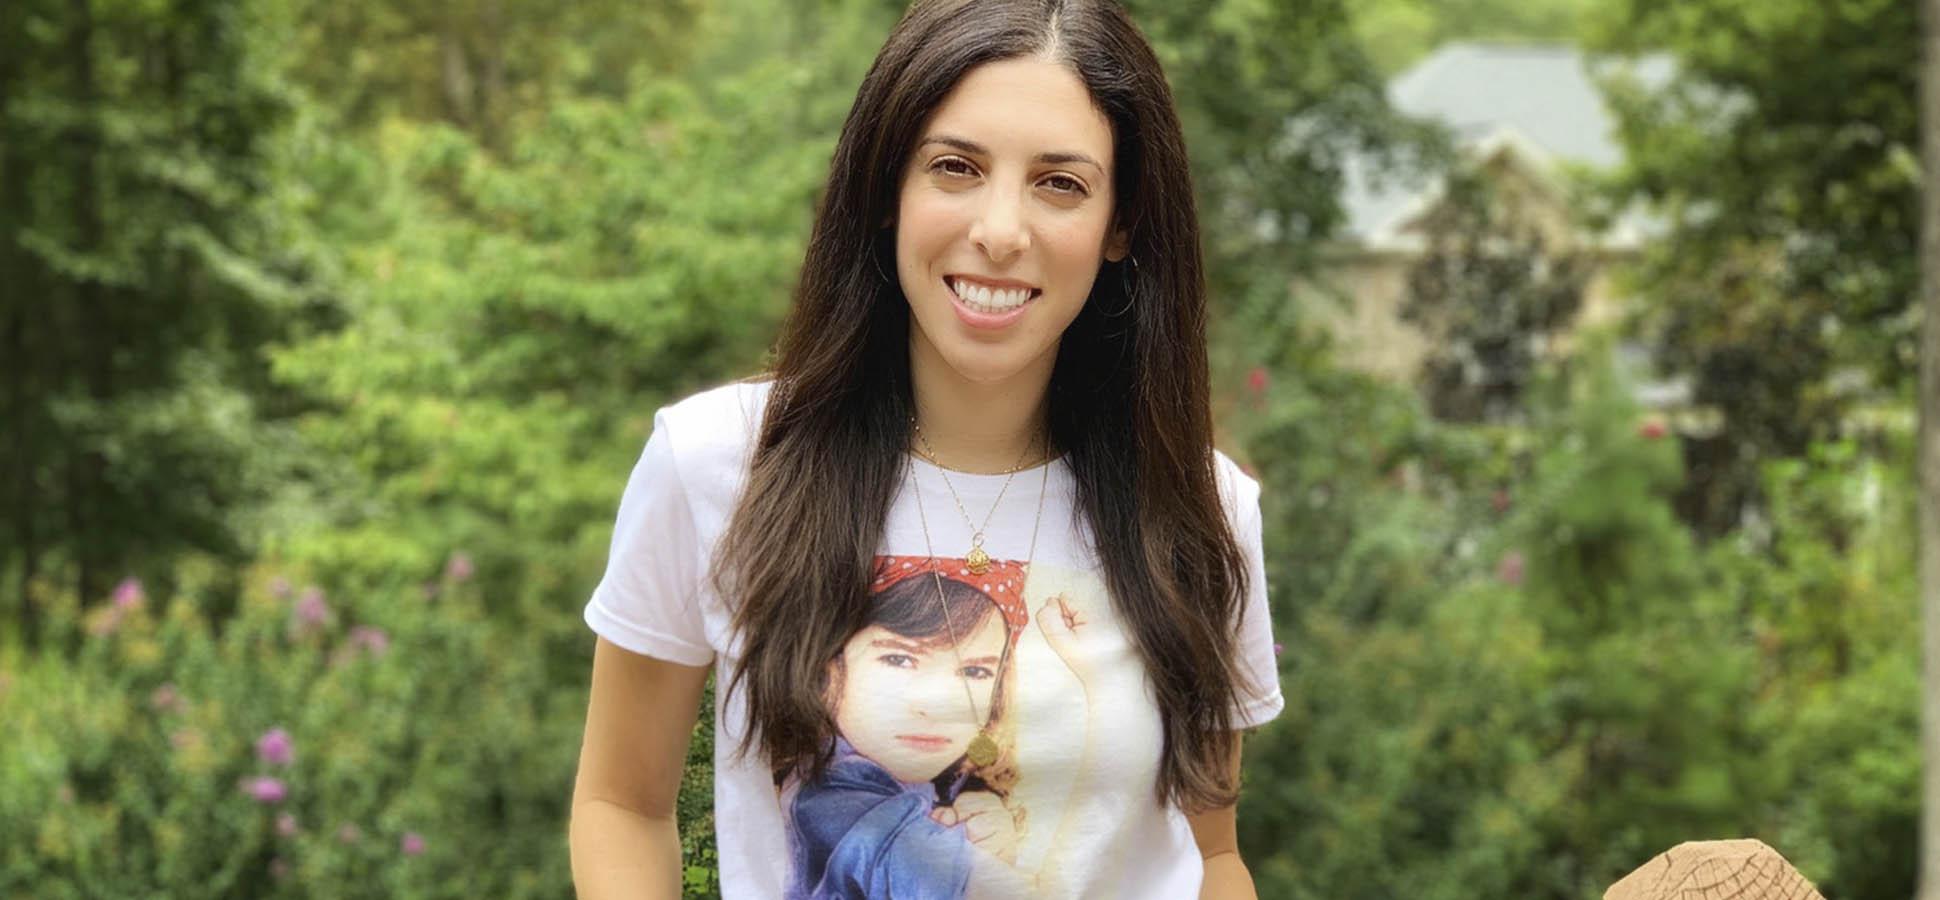 Alexa Carlin